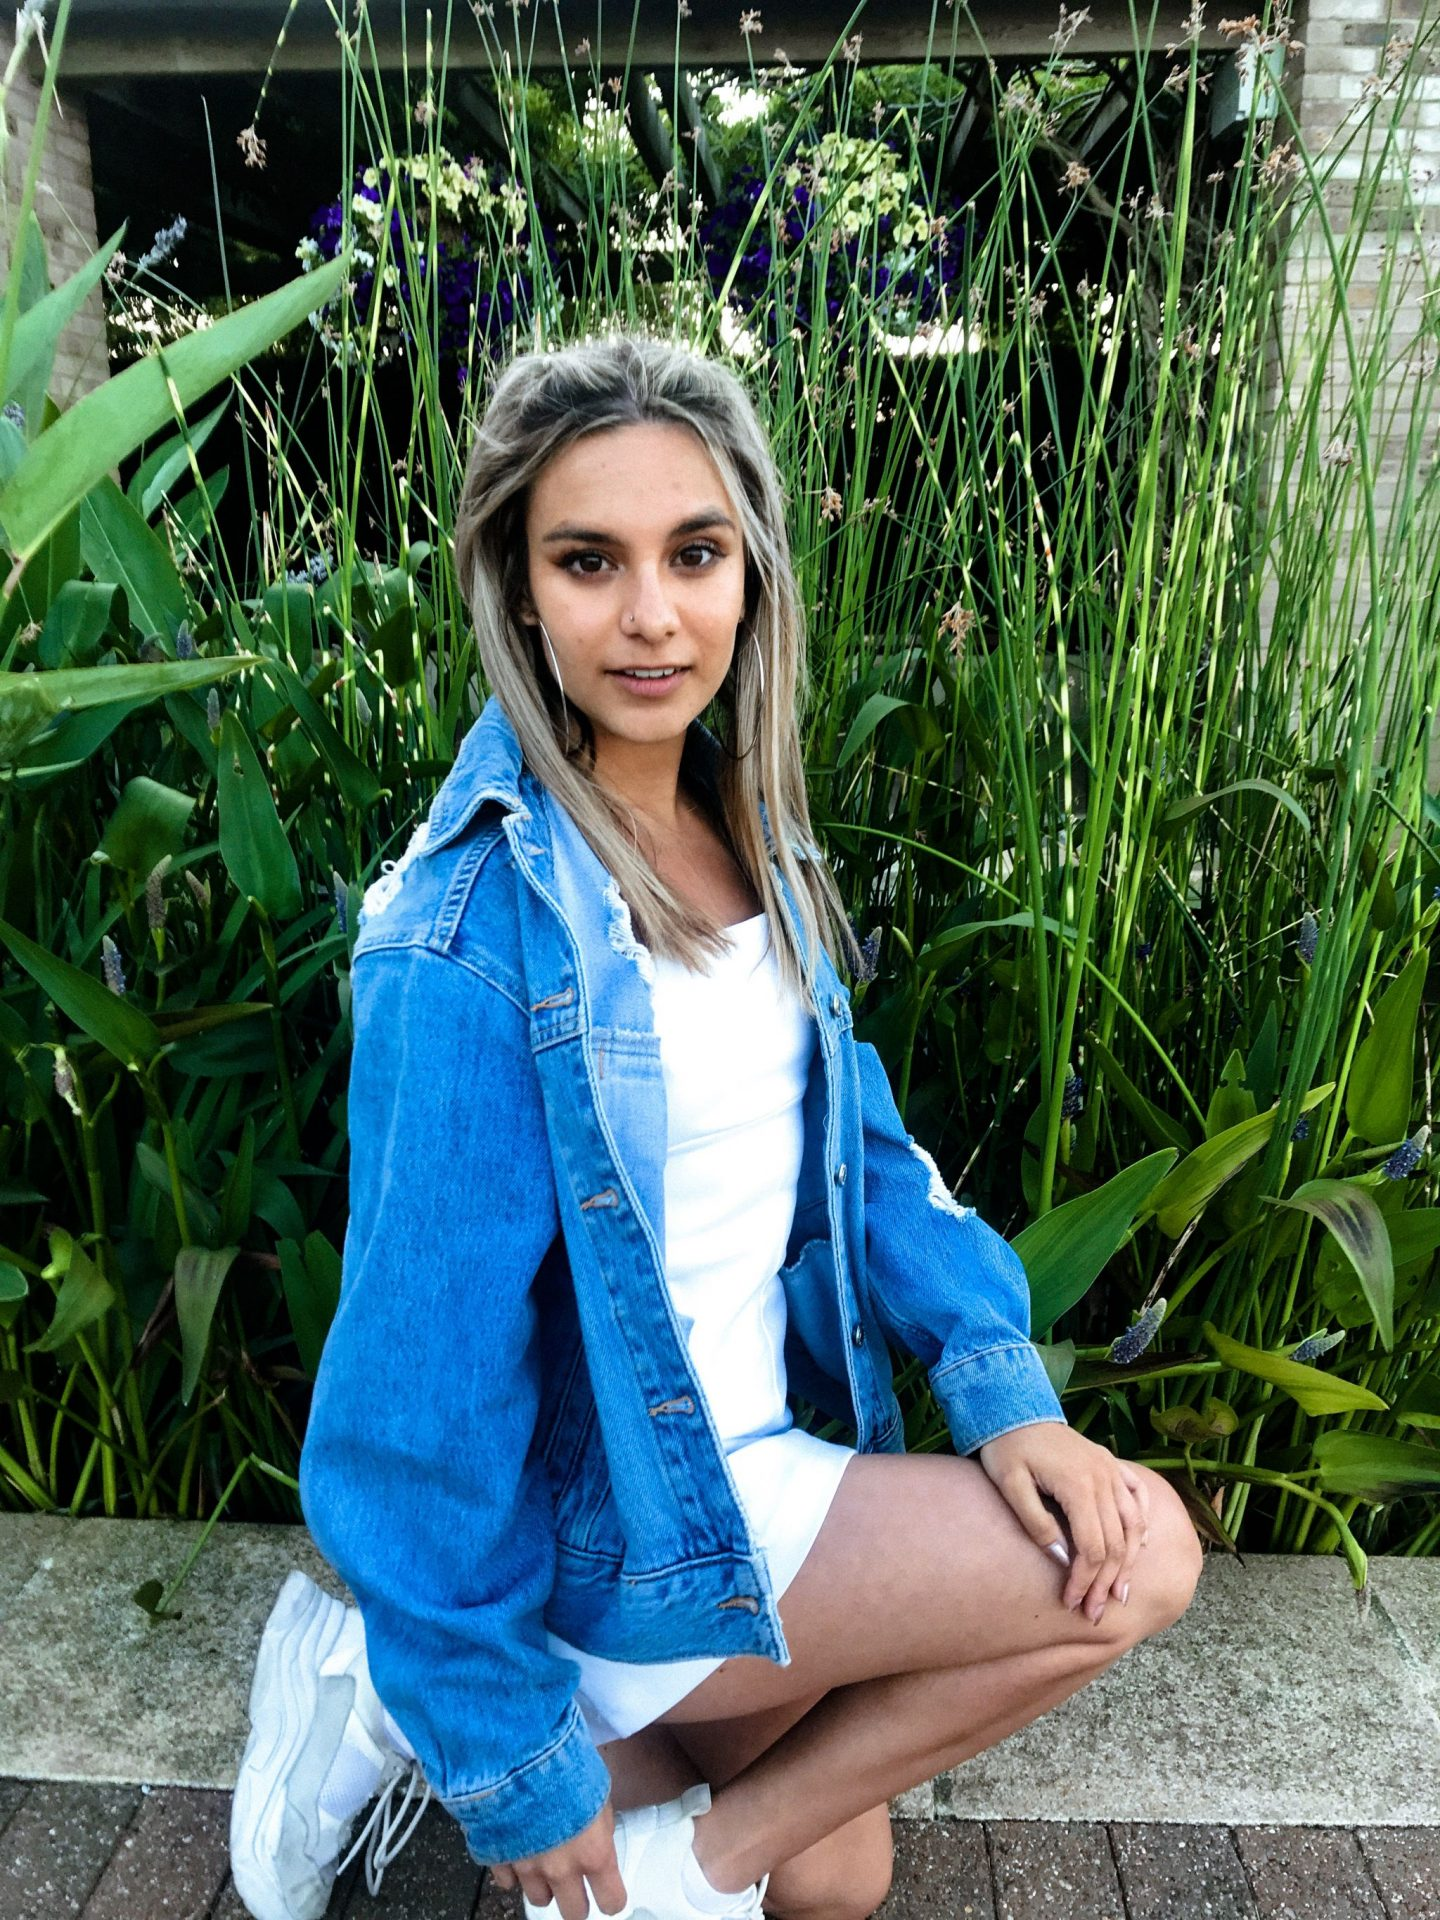 yasmin stefanie wimbledon urban outfitters white audrey slip dress topshop denim jacket ciara chunky trainers